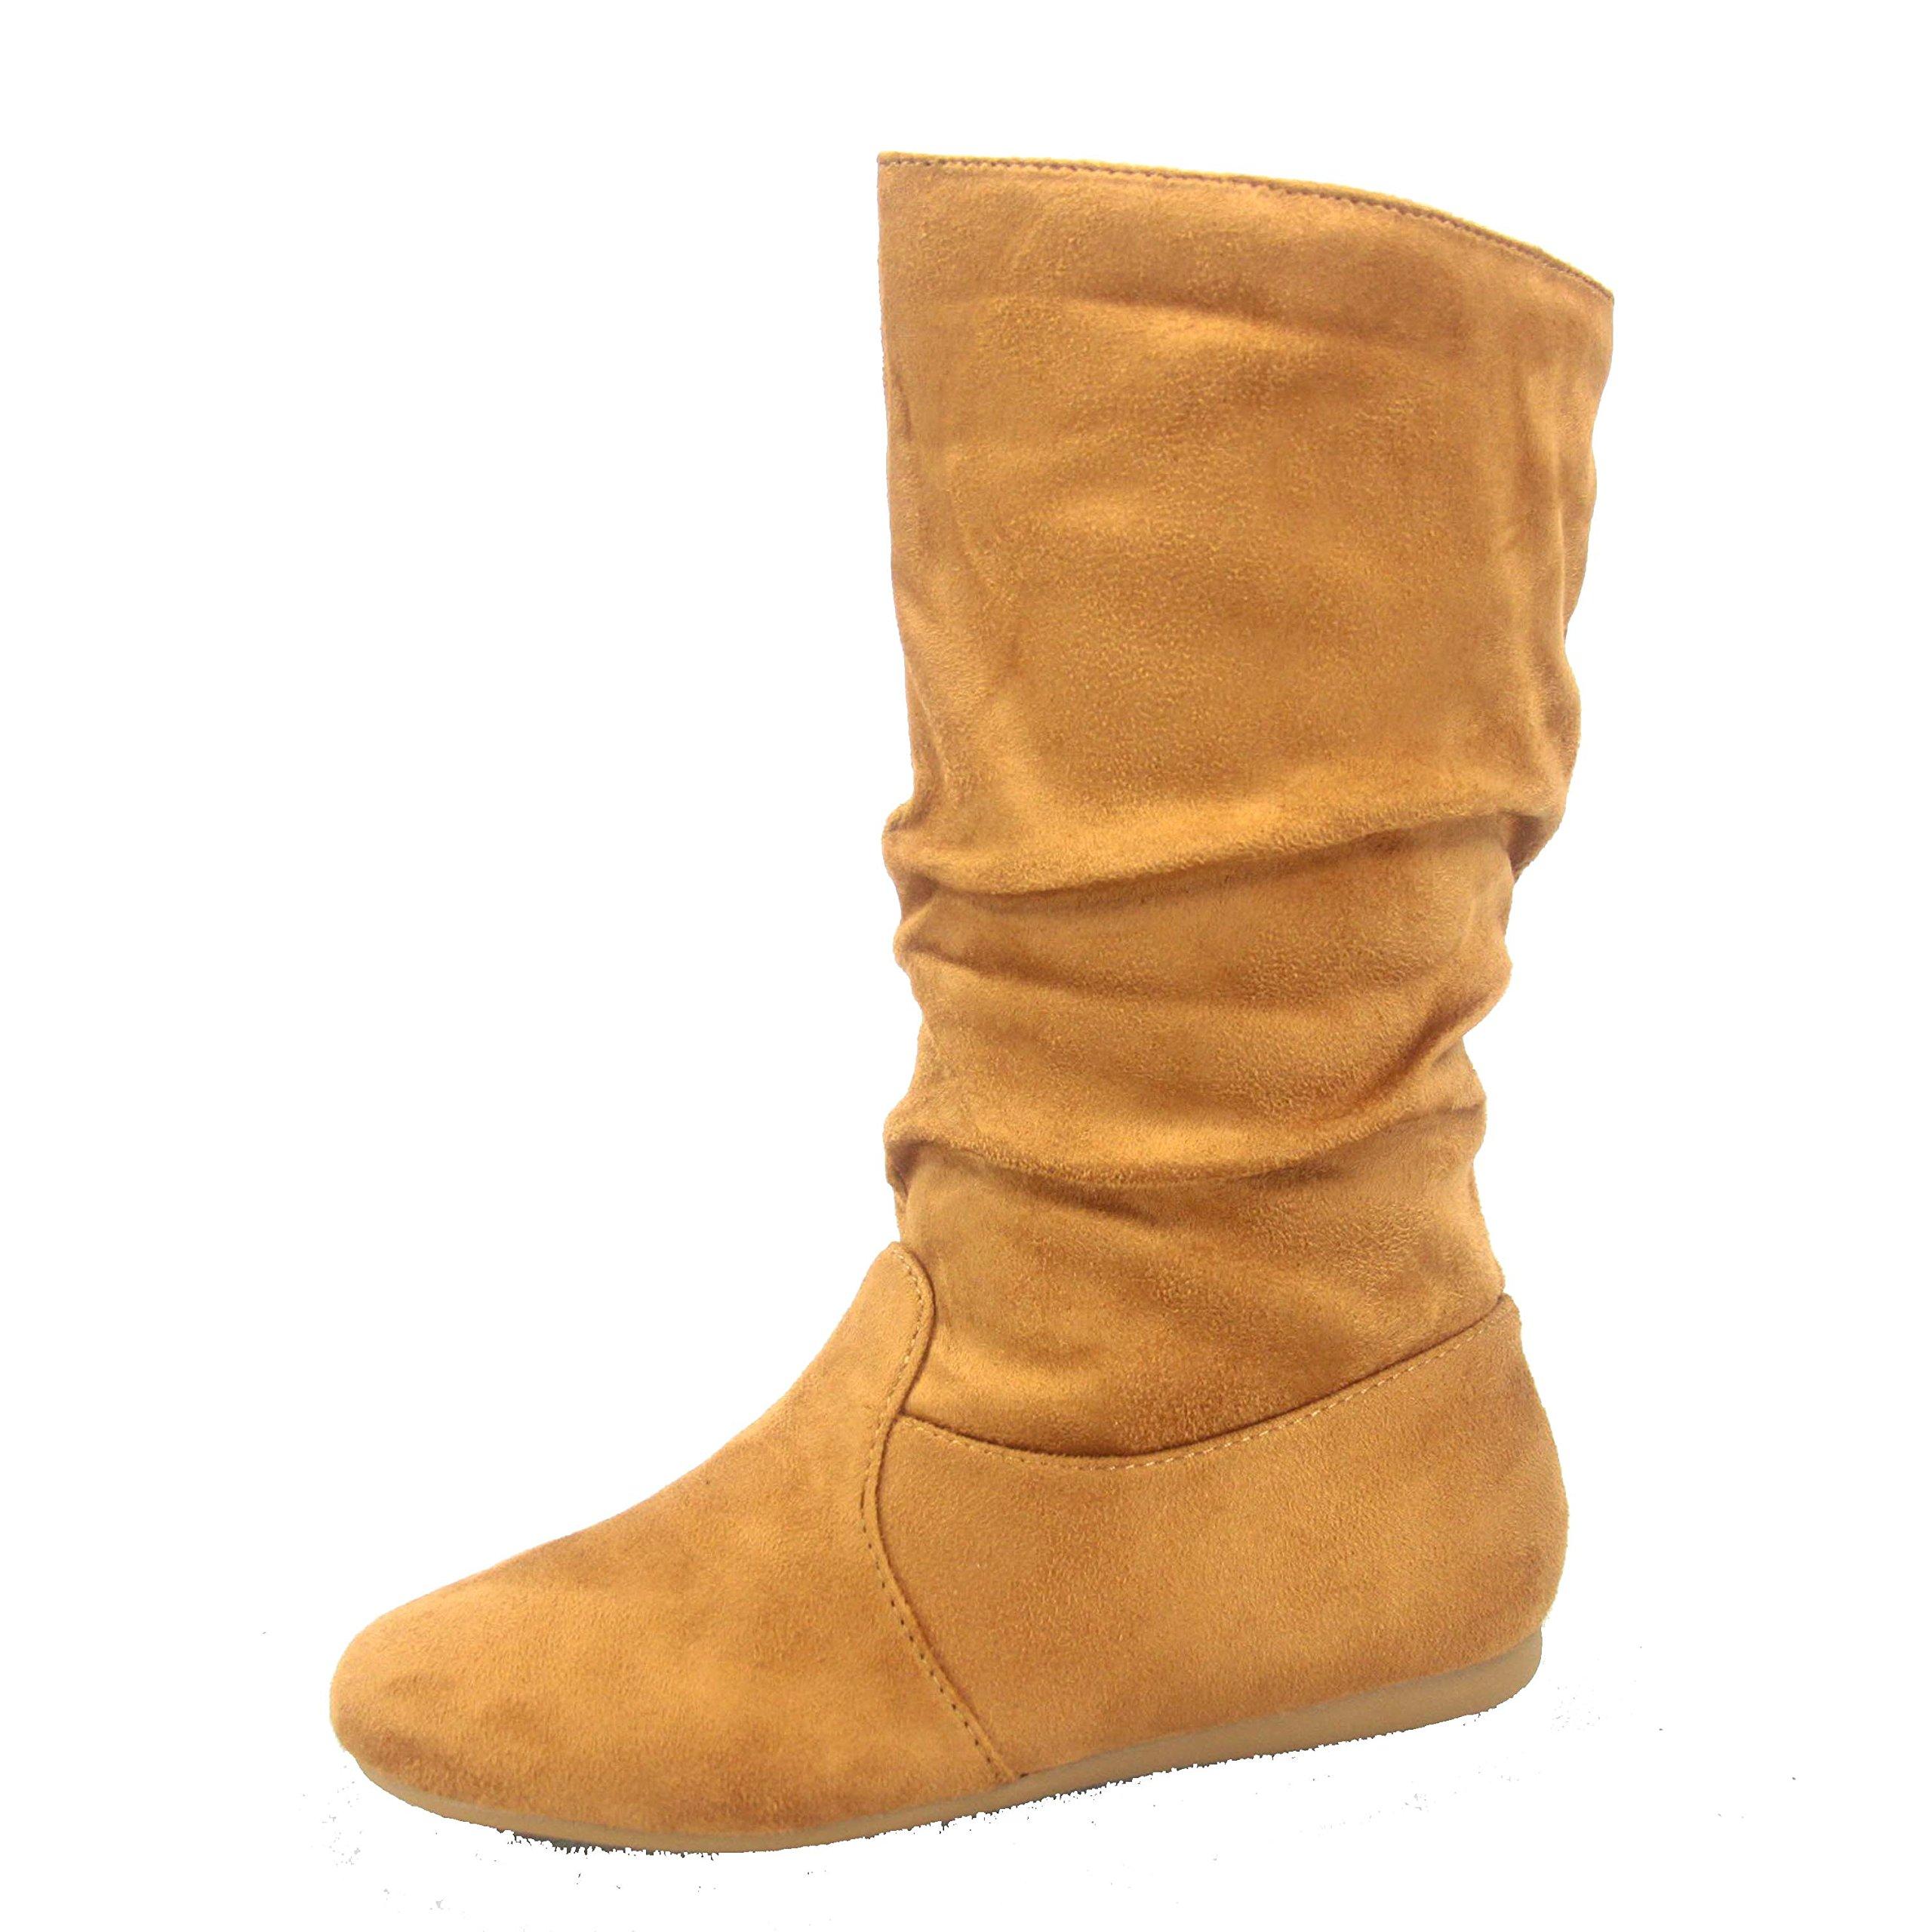 Forever Link Selena-23k Girl's Kid's Cute Causal Zipper Mid Calf Slouchy Flat Boot Shoes (9 B(M) US, Tan)